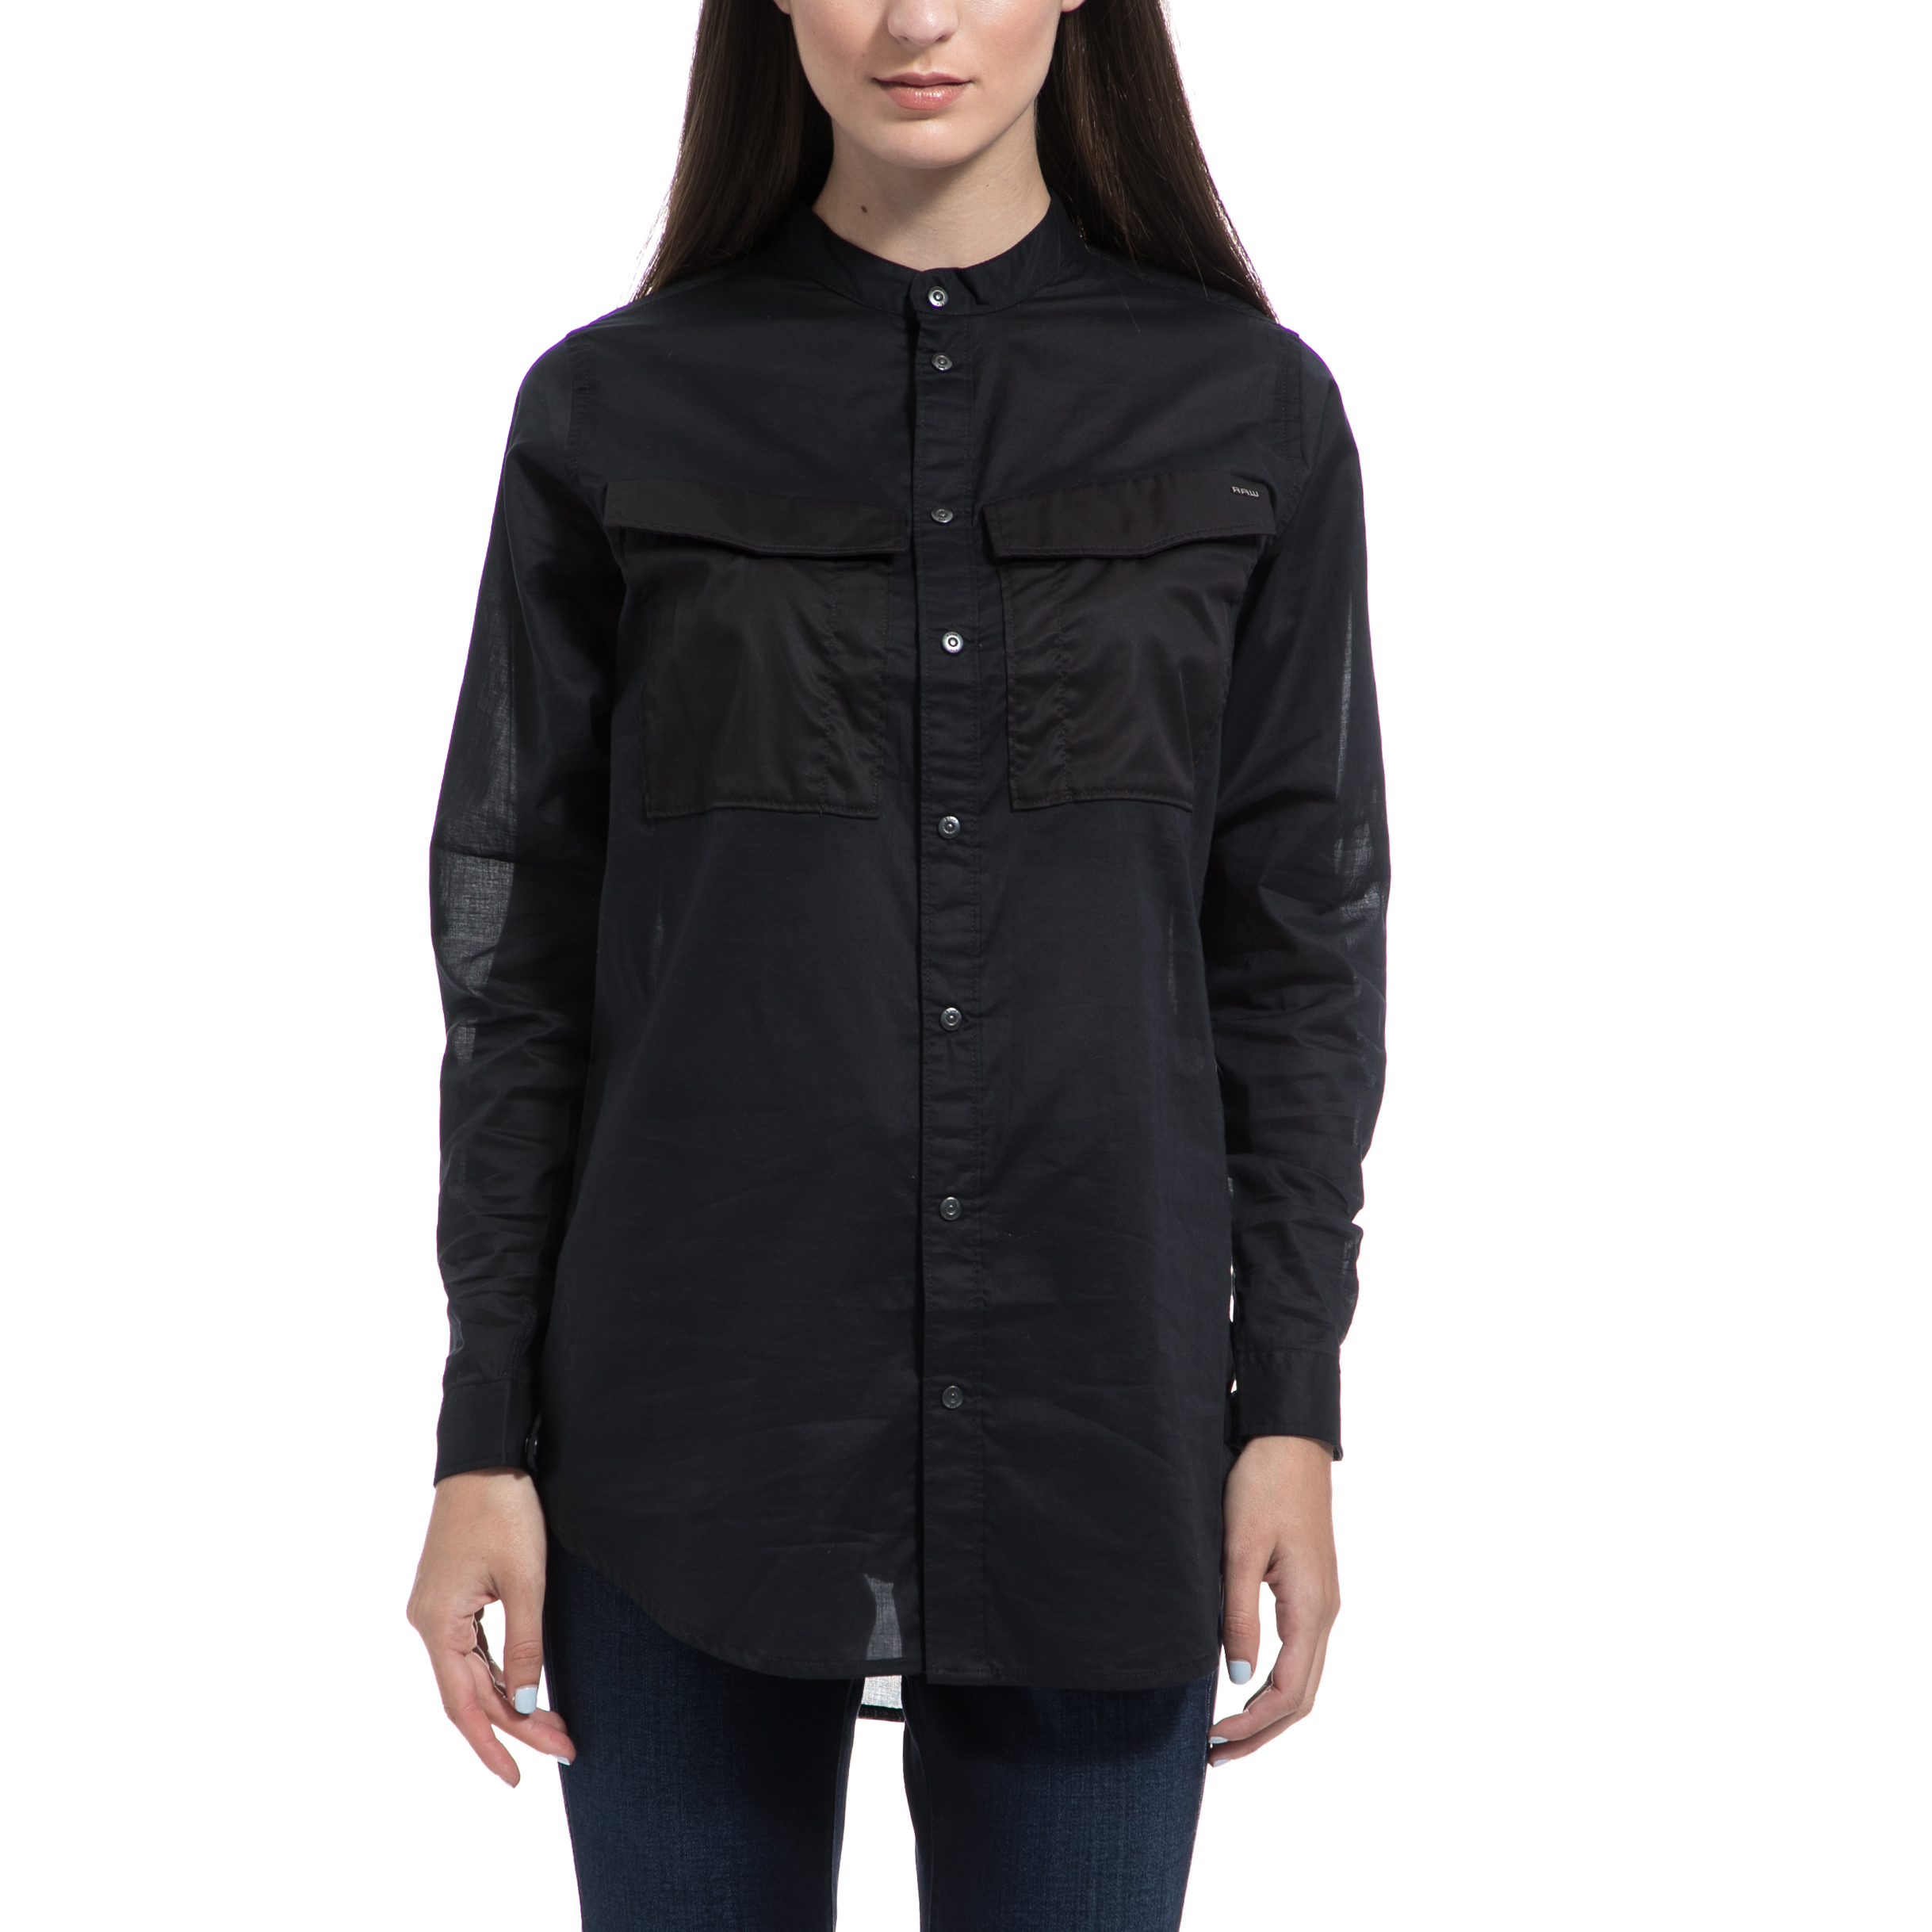 G-STAR RAW - Γυναικείο πουκάμισο G-STAR RAW μαύρο γυναικεία ρούχα πουκάμισα μακρυμάνικα